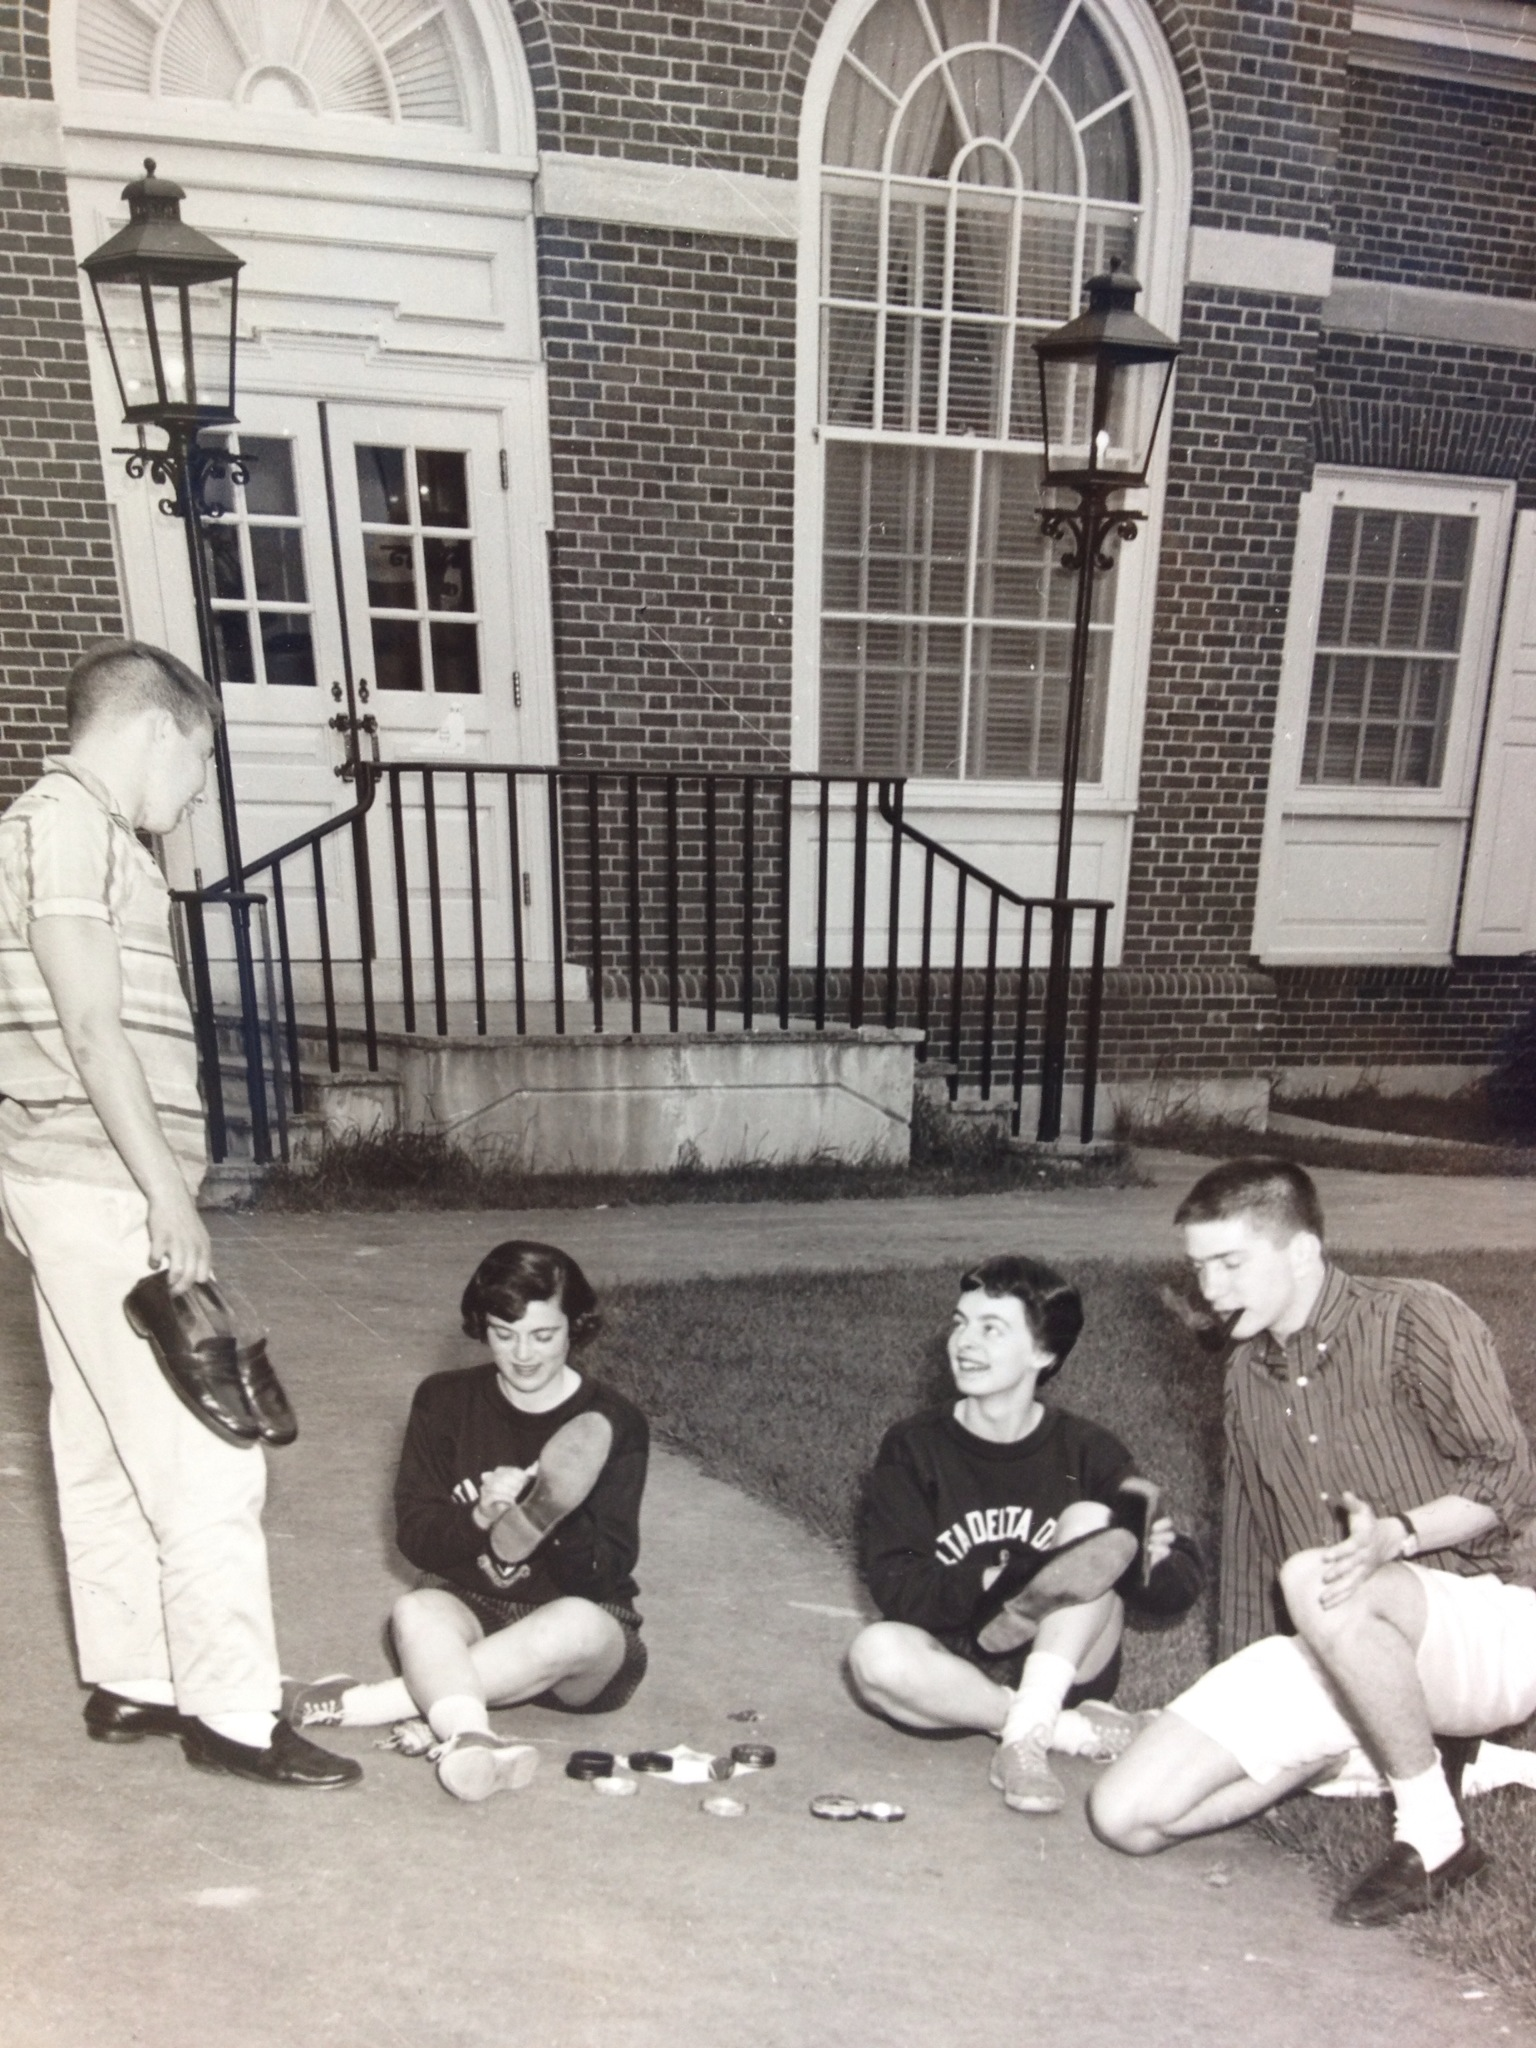 1950s slams polishing. TFM.